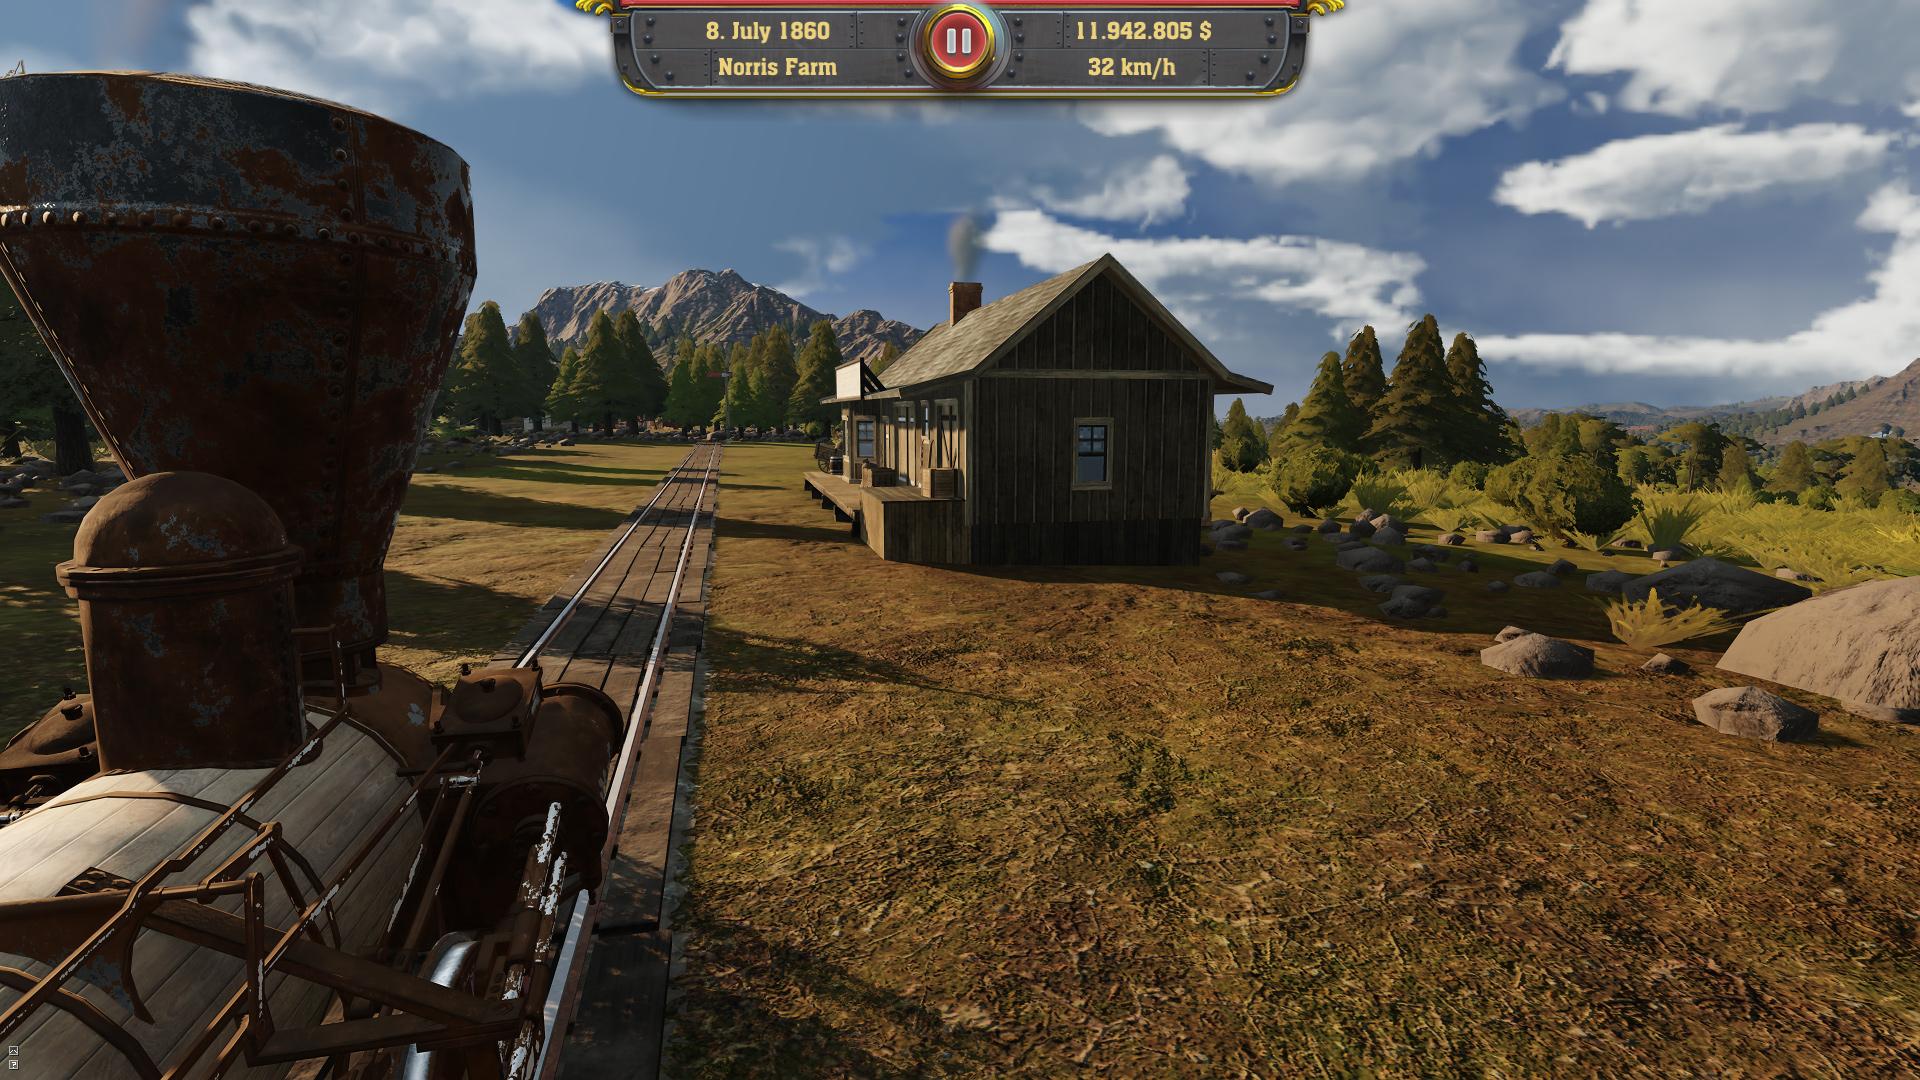 Railway Empire 02 - Railway Empire angekündigt - Tycoon-Simulation-Game